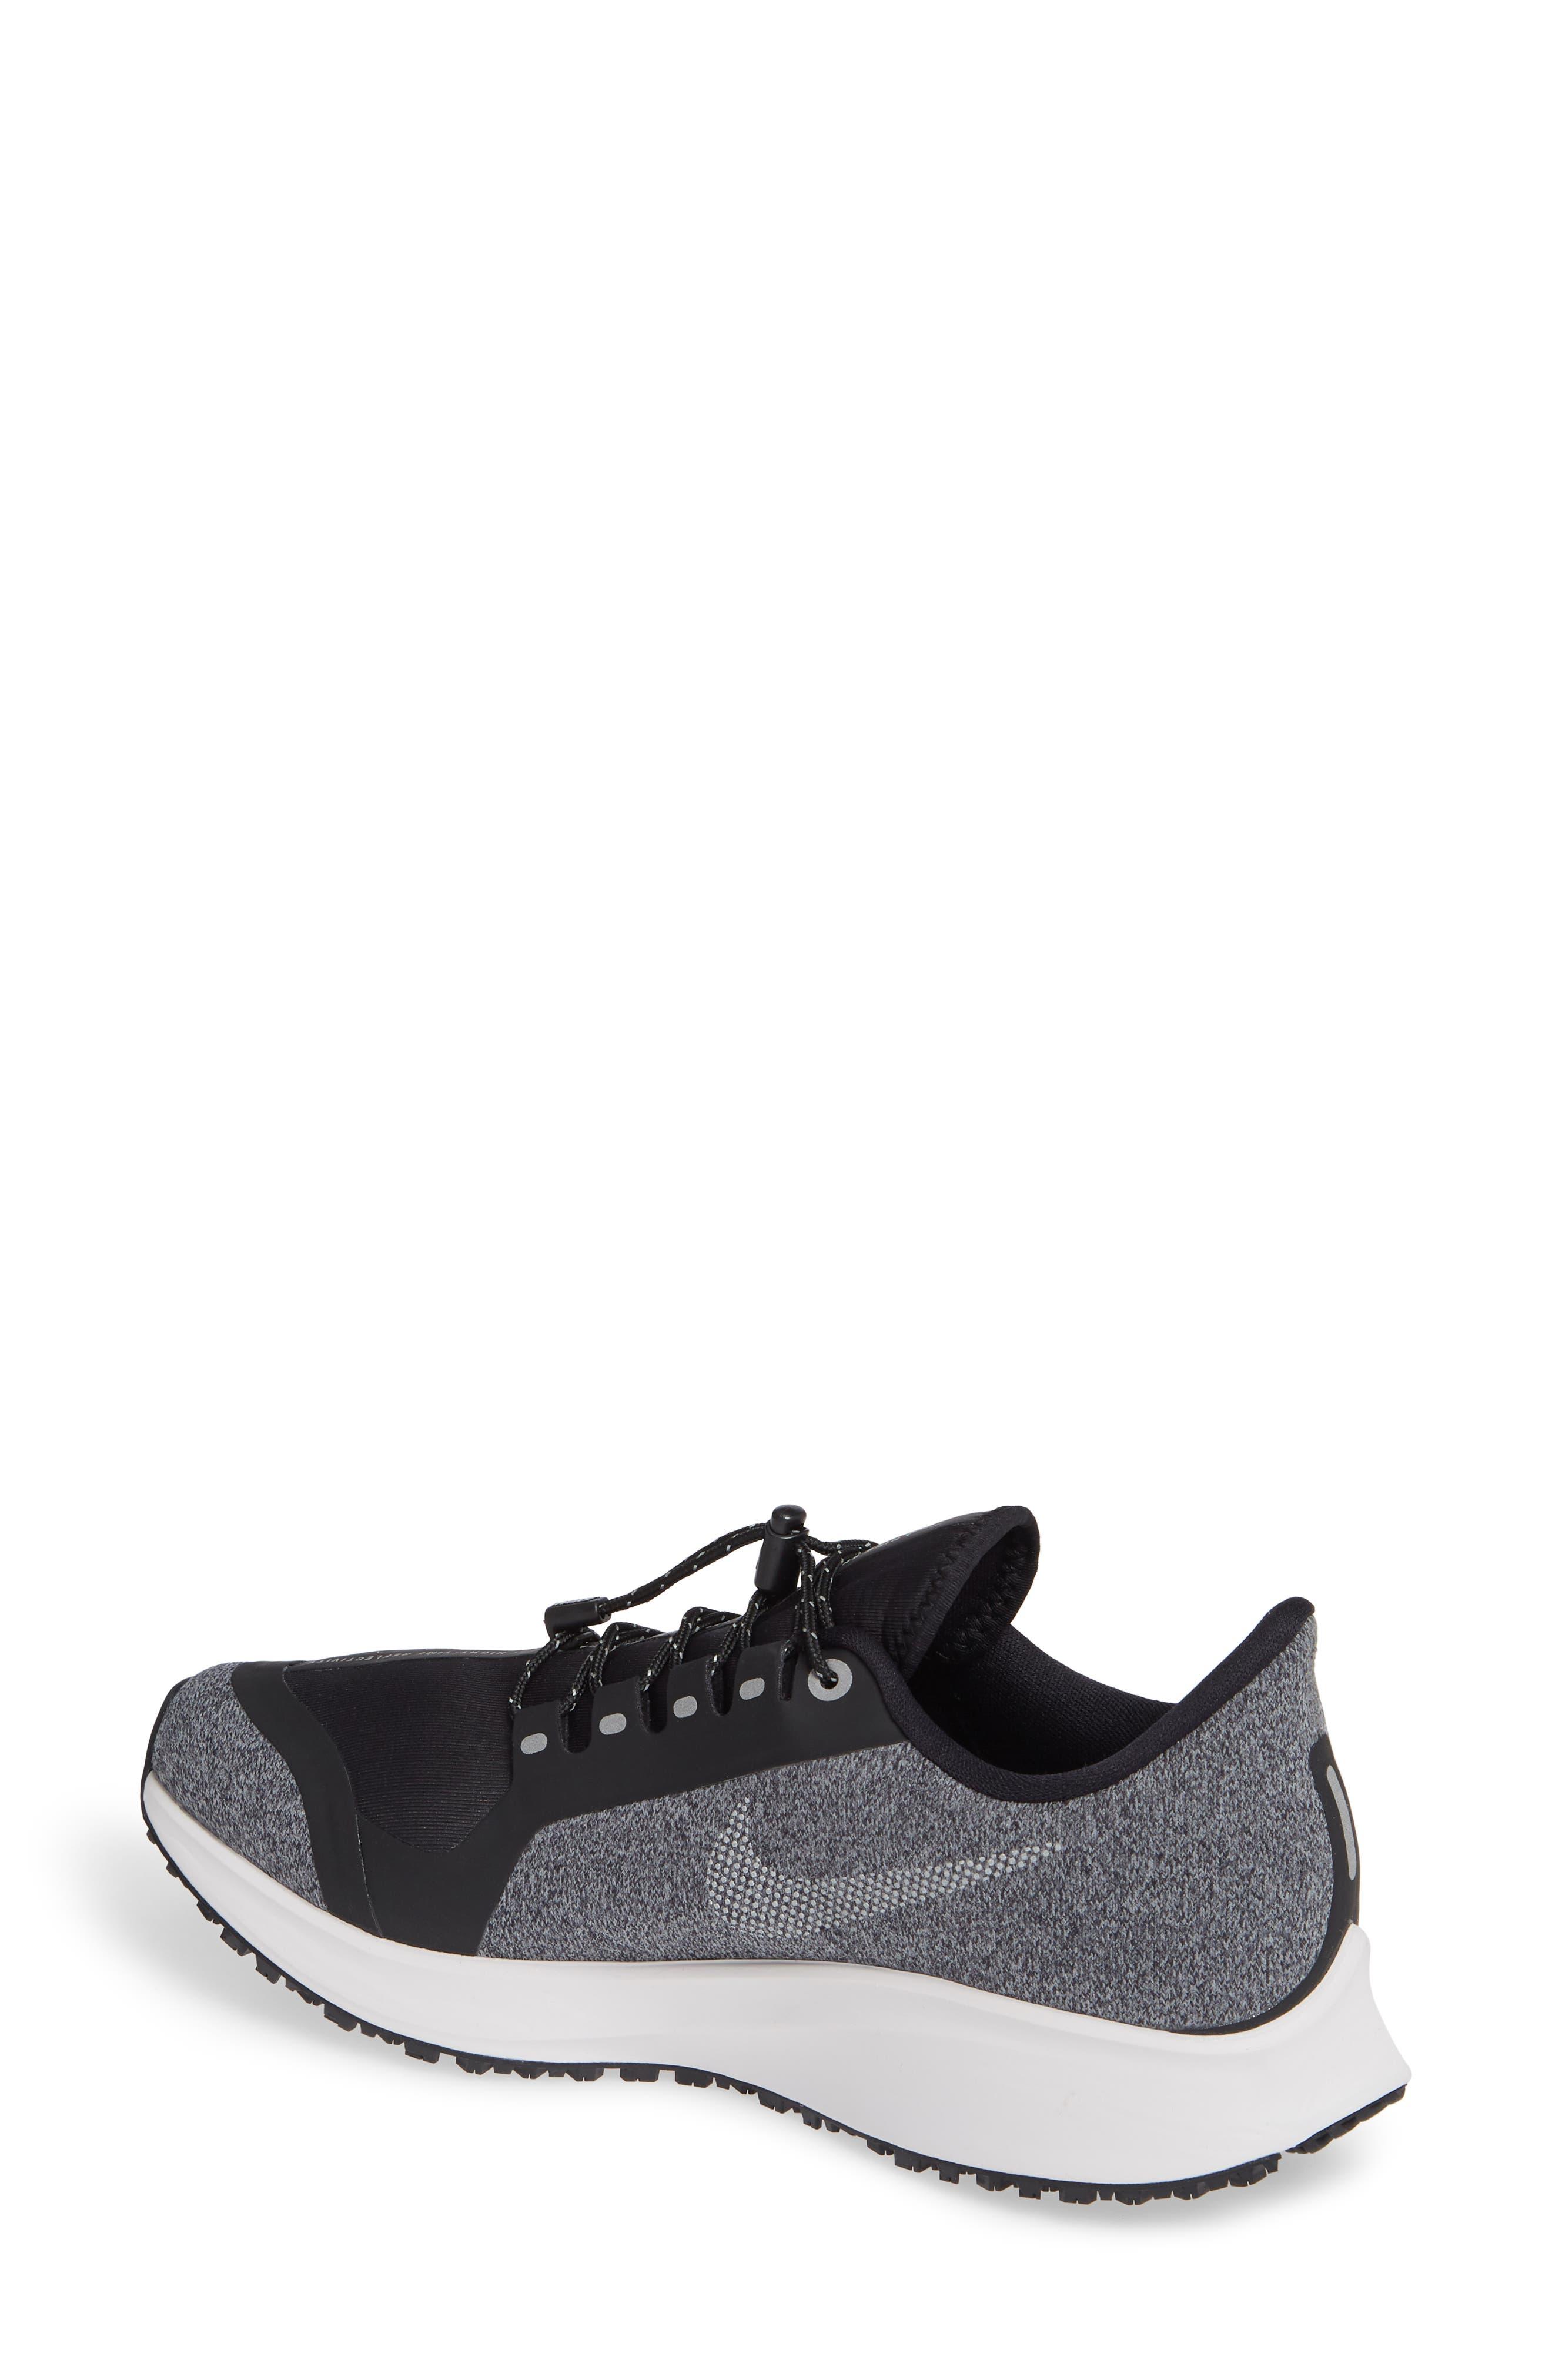 Air Zoom Pegasus 35 Shield GS Water Repellent Running Shoe,                             Alternate thumbnail 2, color,                             BLACK/ WHITE-COOL GREY-GREY